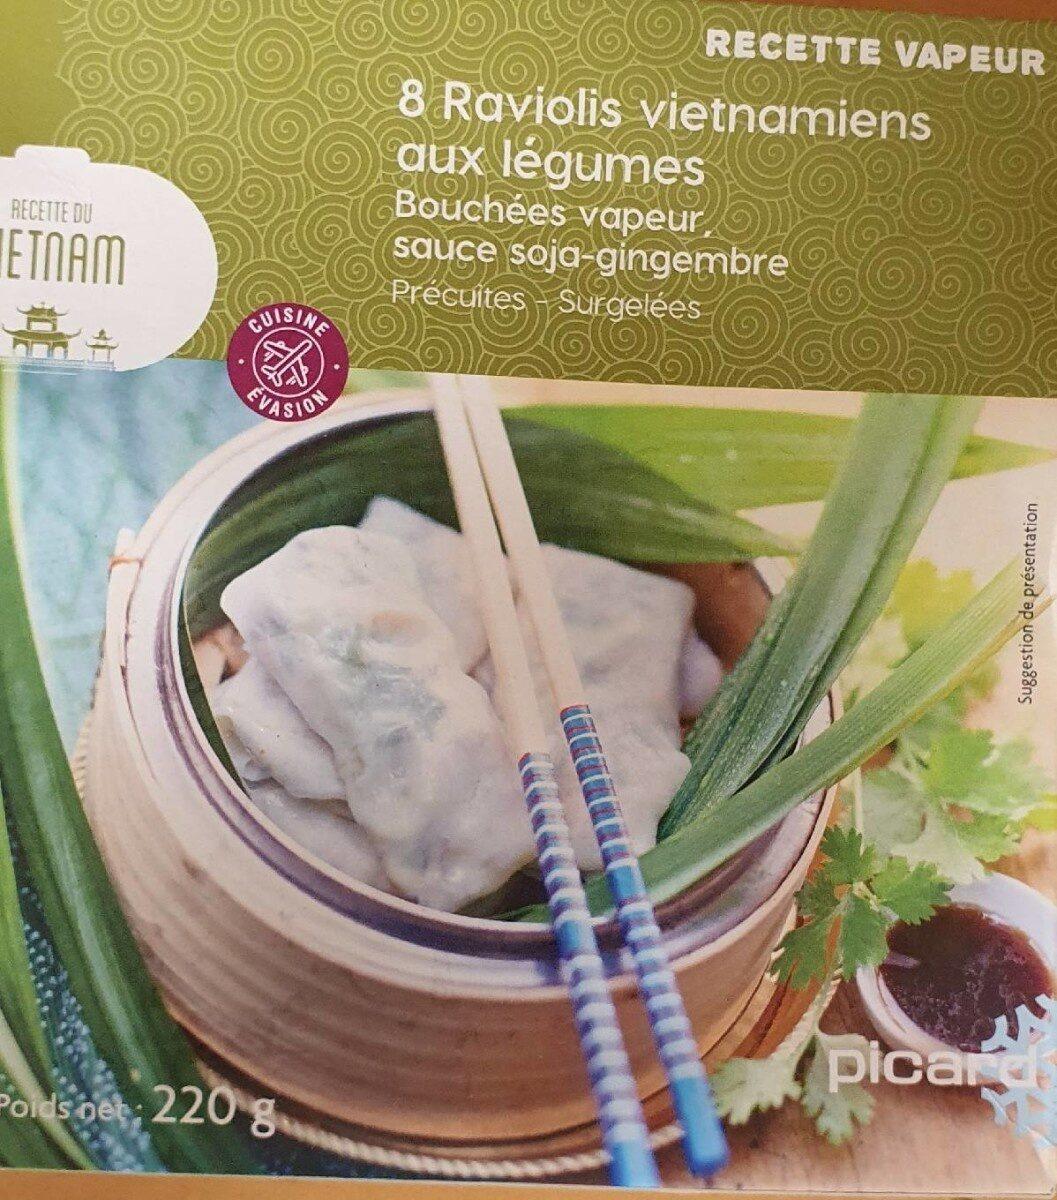 Raviolis vietnamiens aux légumes - Produit - fr